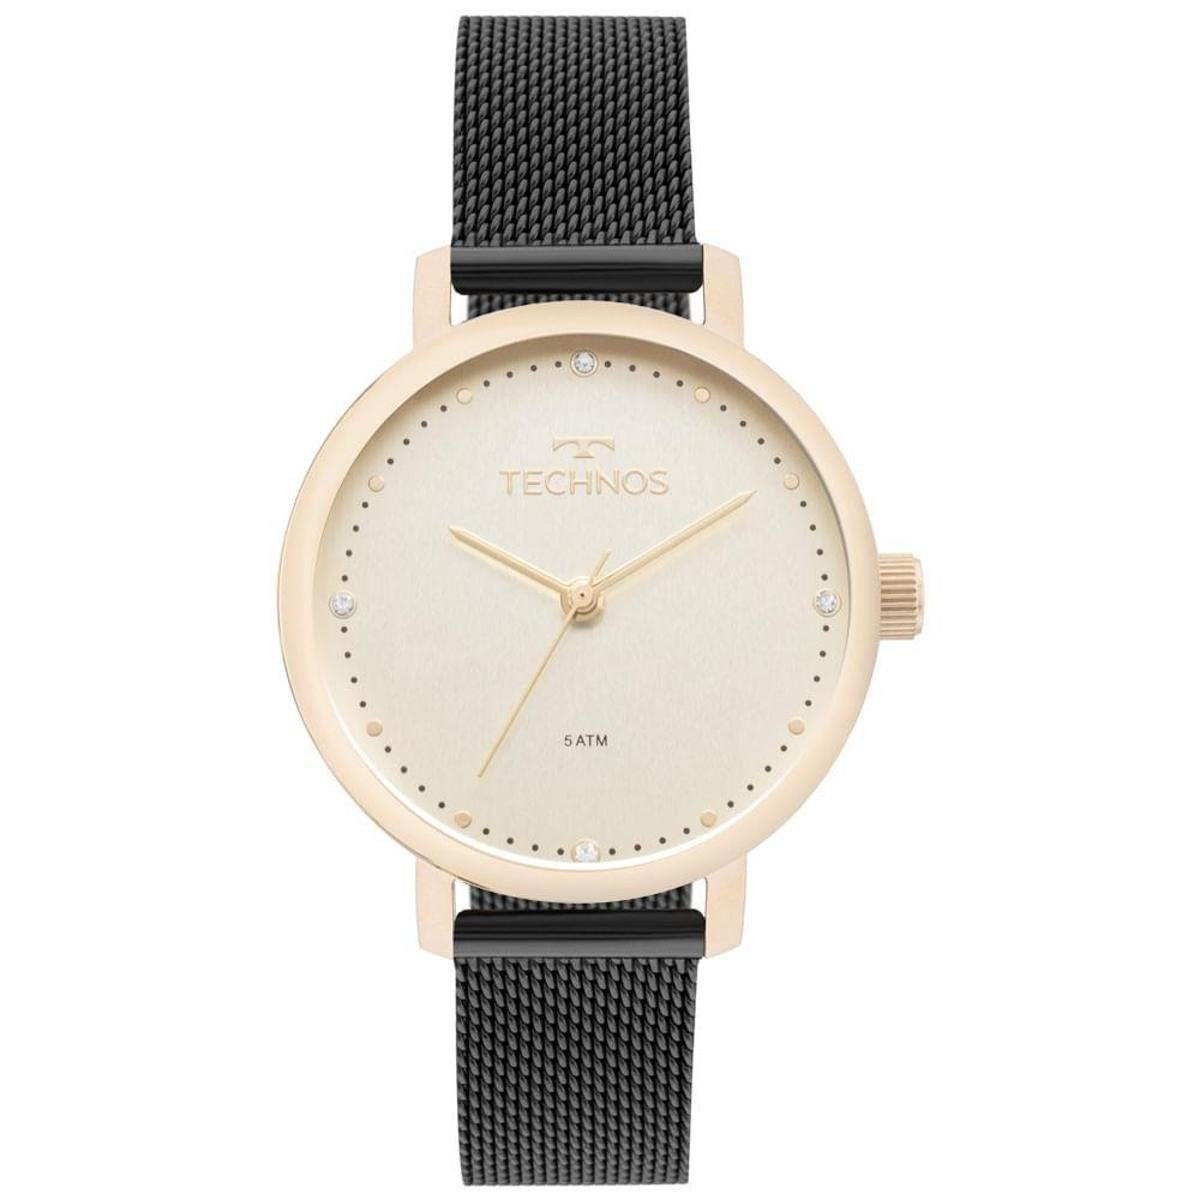 bdb0070929c1b Relógio Technos Feminino Trend Bicolor - 2035MML 5X 2035MML 5X - Compre  Agora